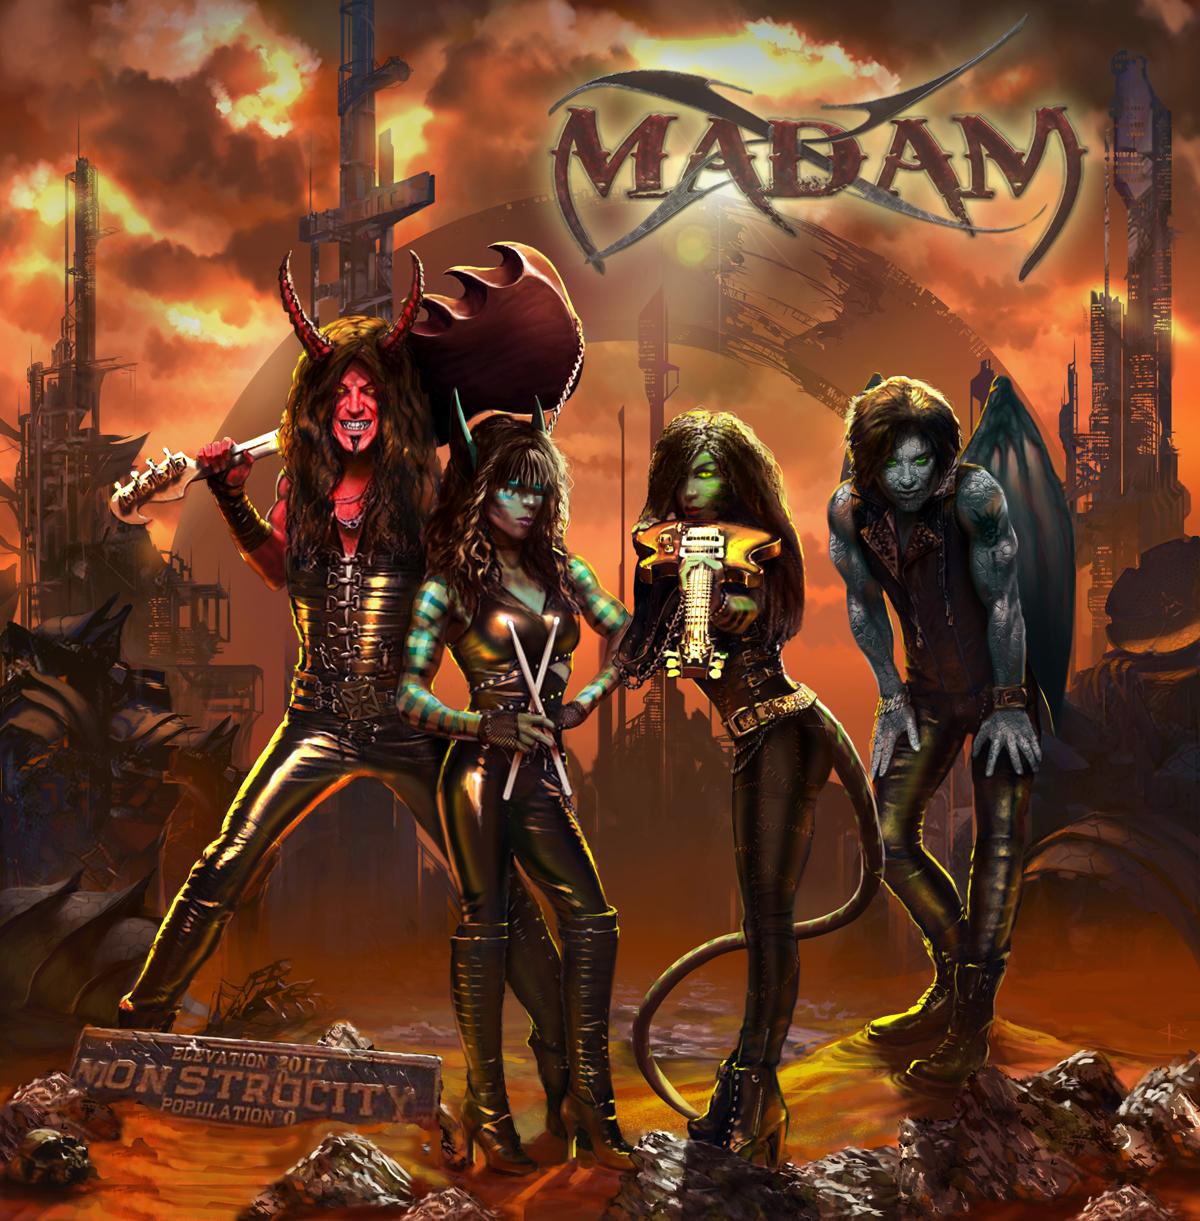 MadamX_Monstrocity